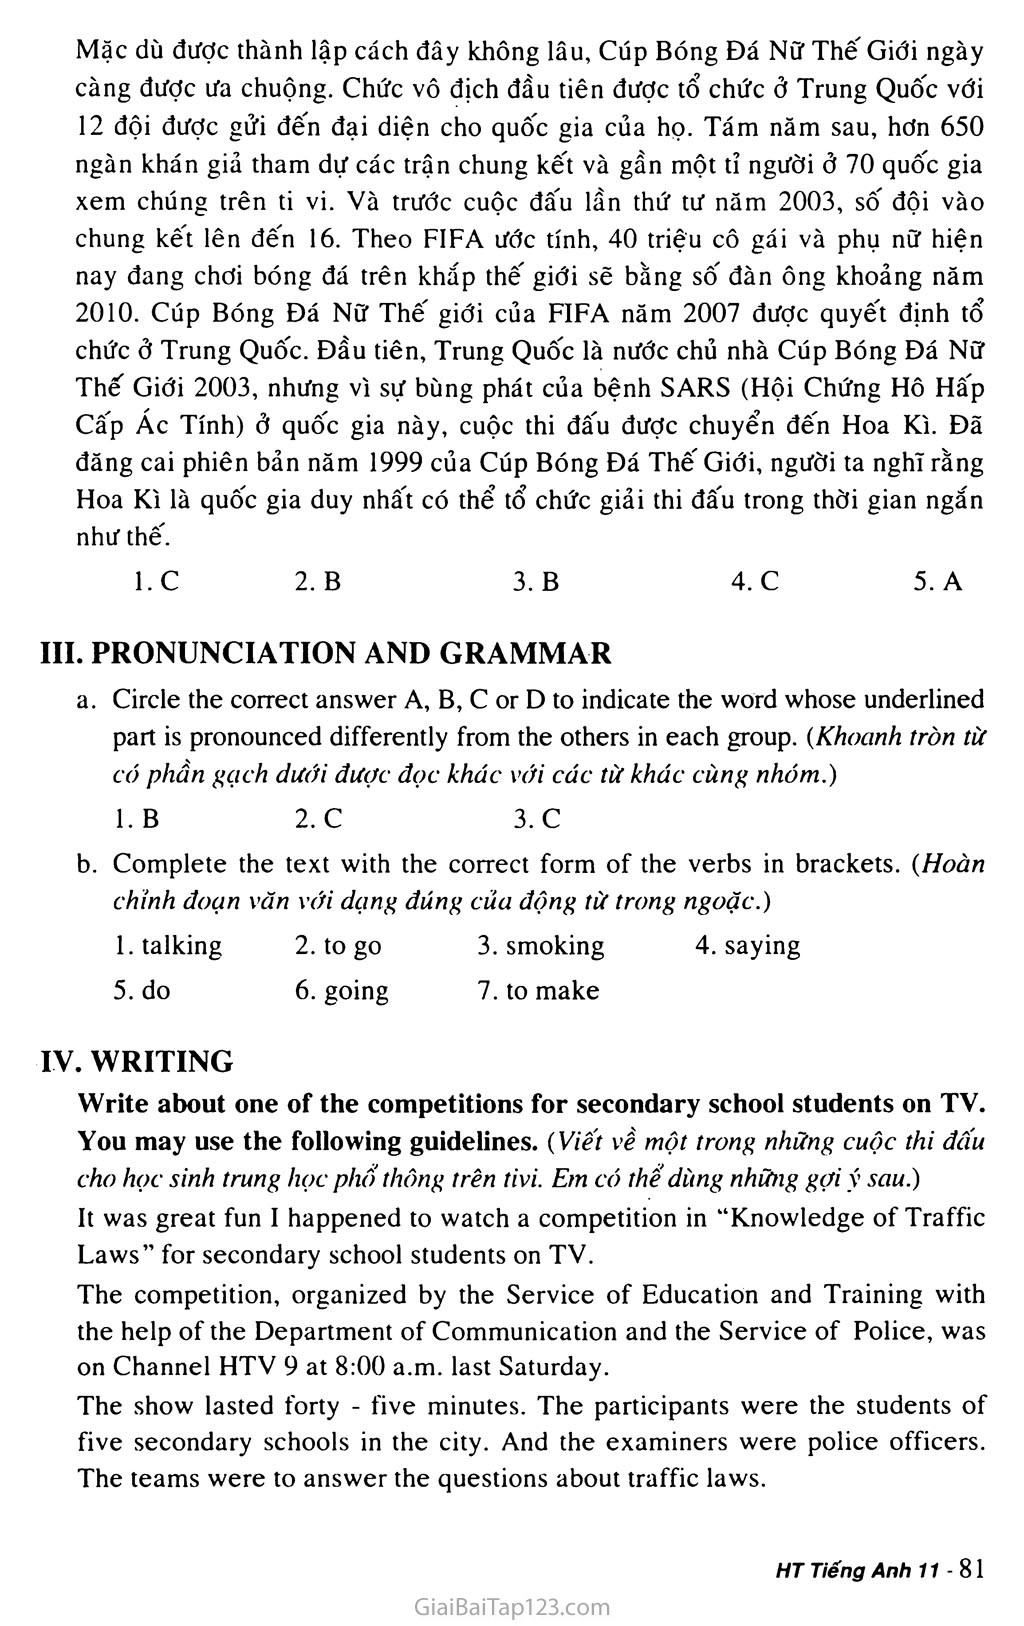 Test Yourself B trang 2